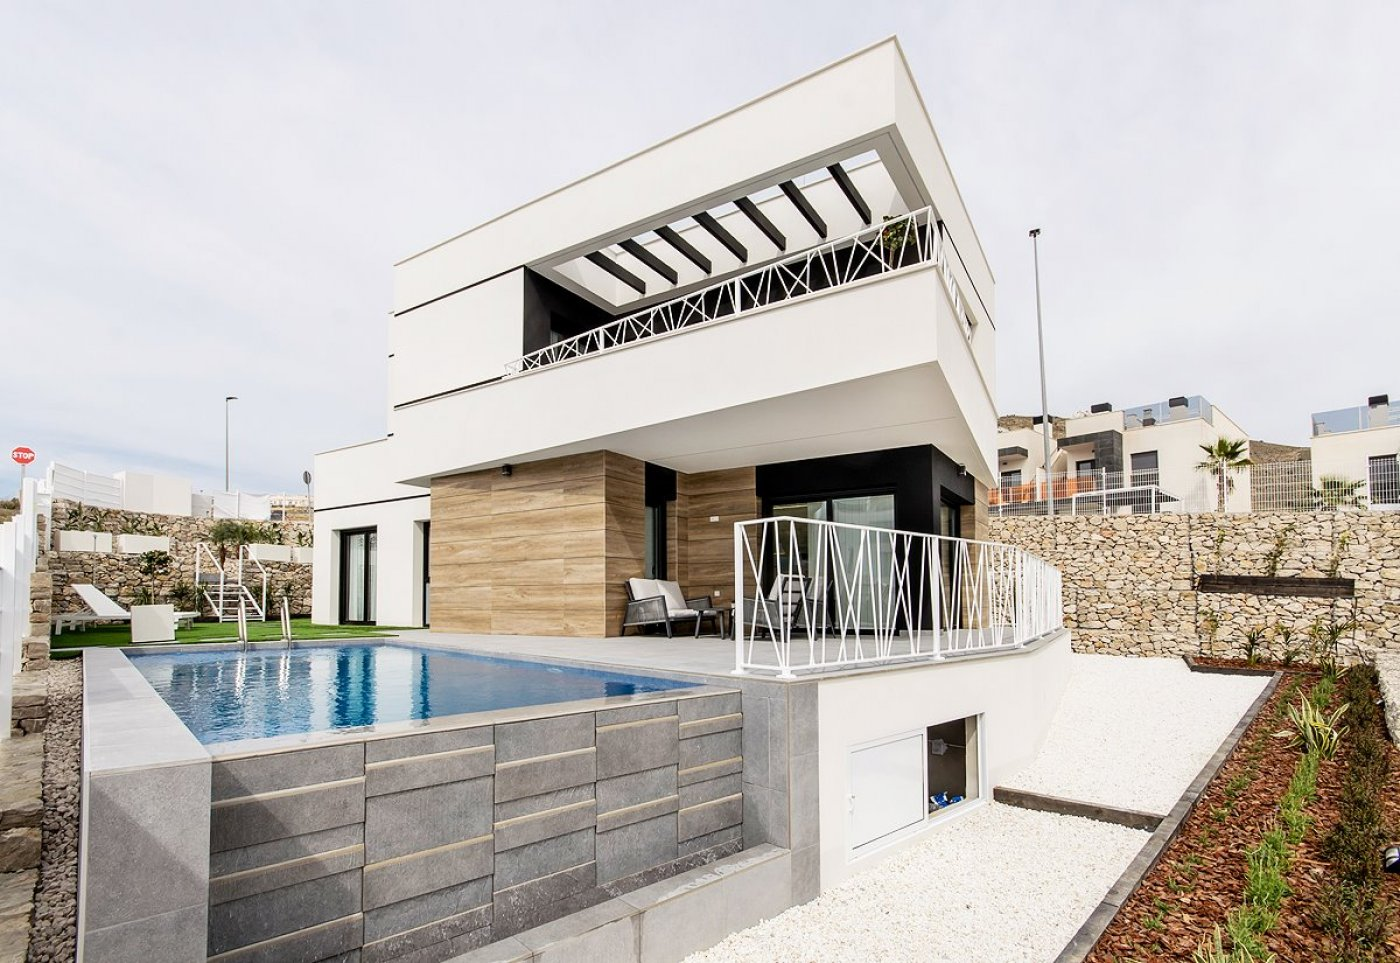 Detached - New Build - Finestrat - Balcón de Finestrat